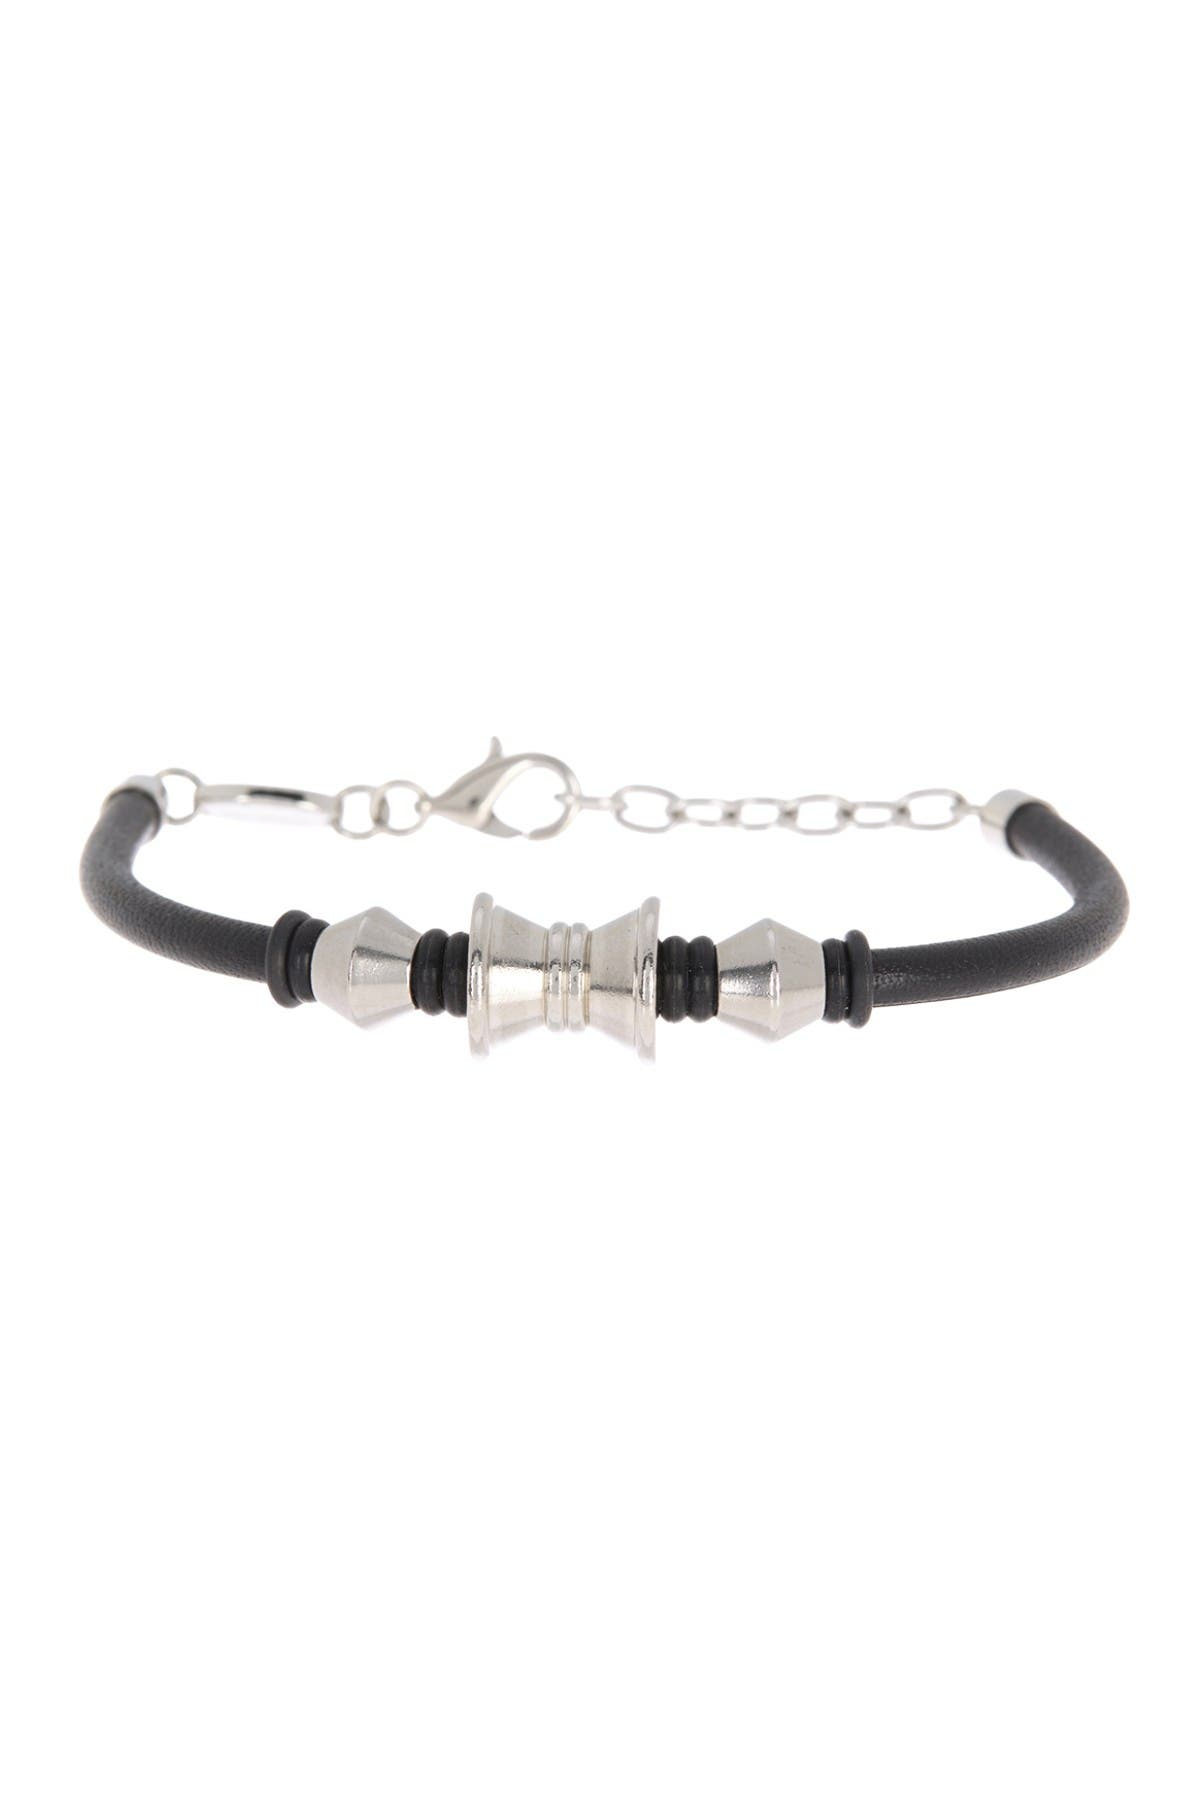 Image of Bruno Banani Stainless Steel Bead & Leather Bracelet